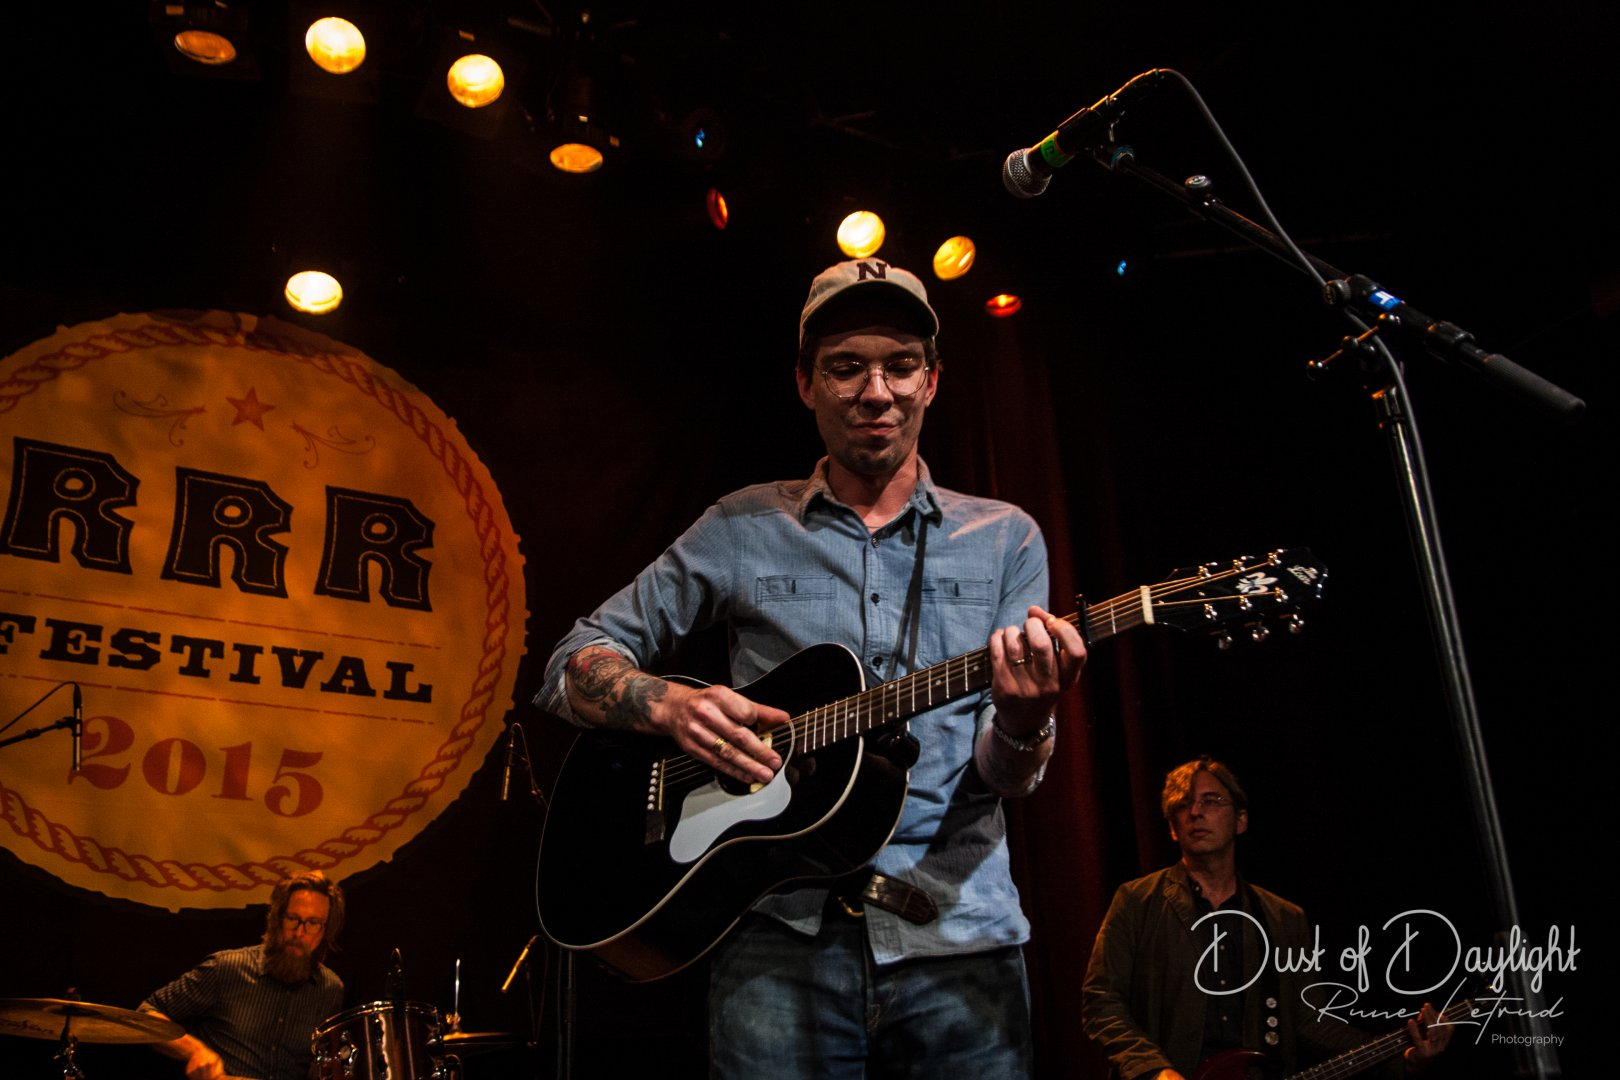 Justin-Townes-Earle-Bergen-2015-0682